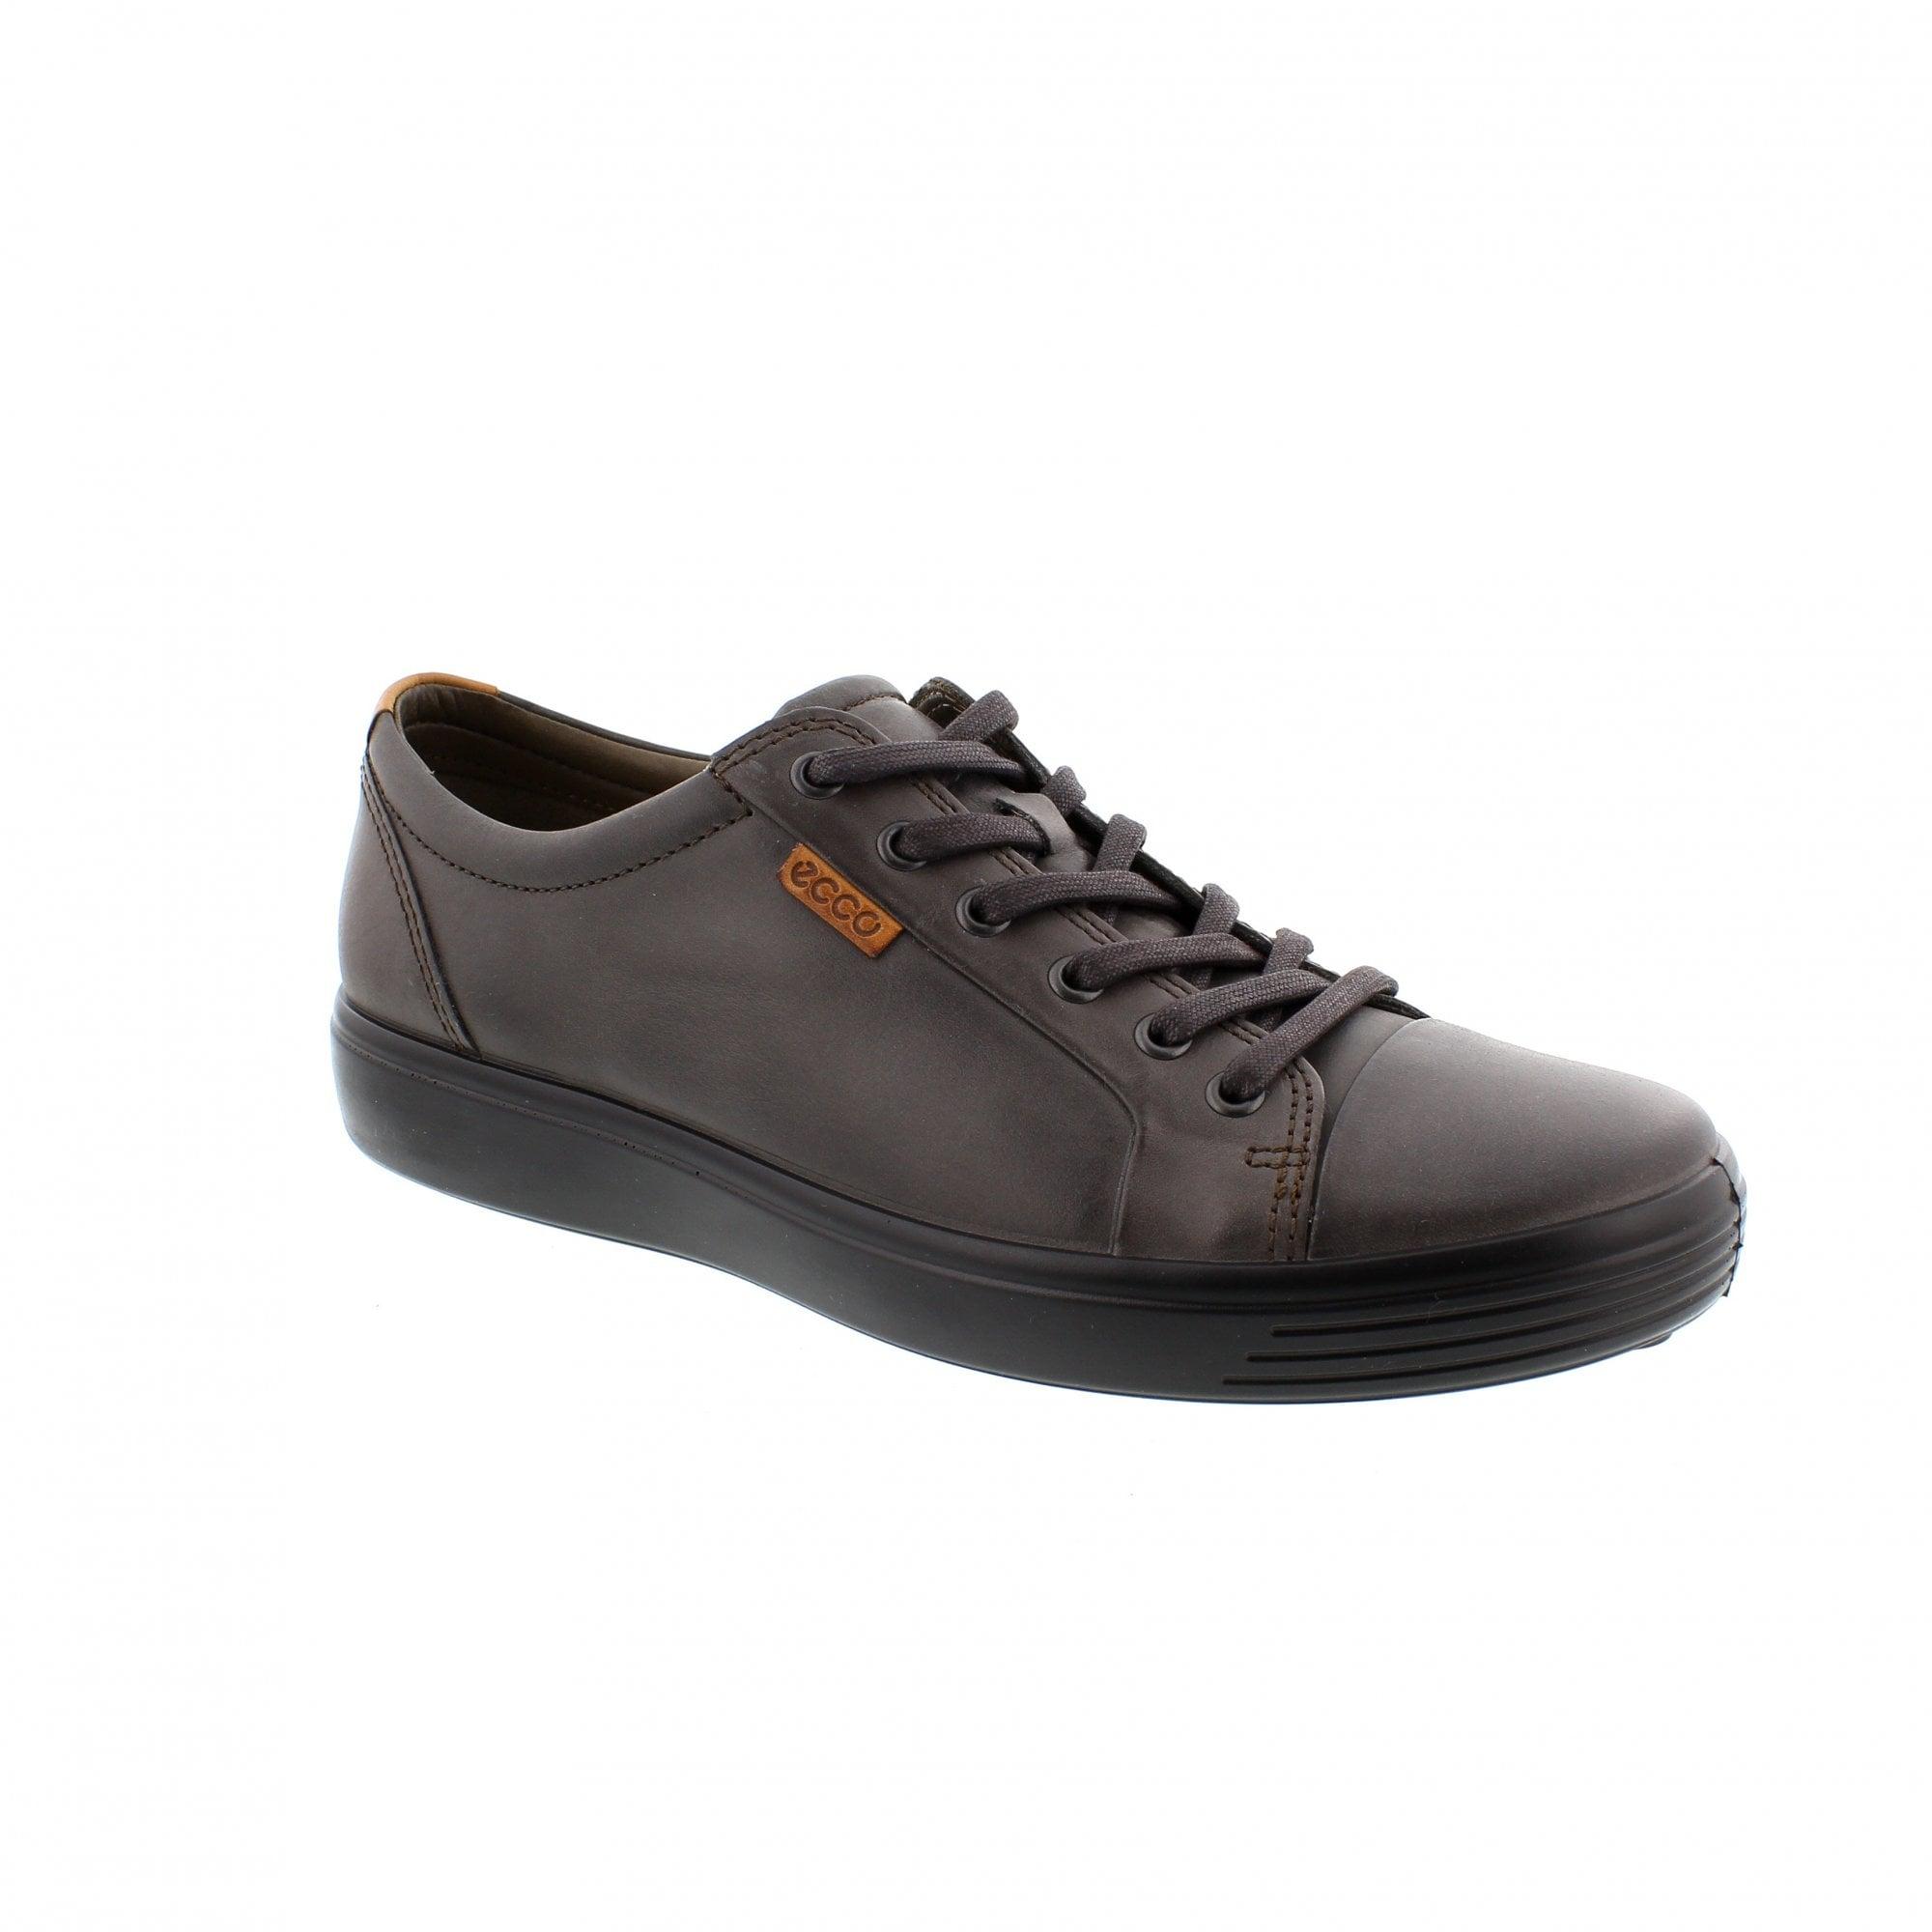 f4fc03814f7dc0 Ecco Soft 7 430004-02507 Mens Lace Up Shoes